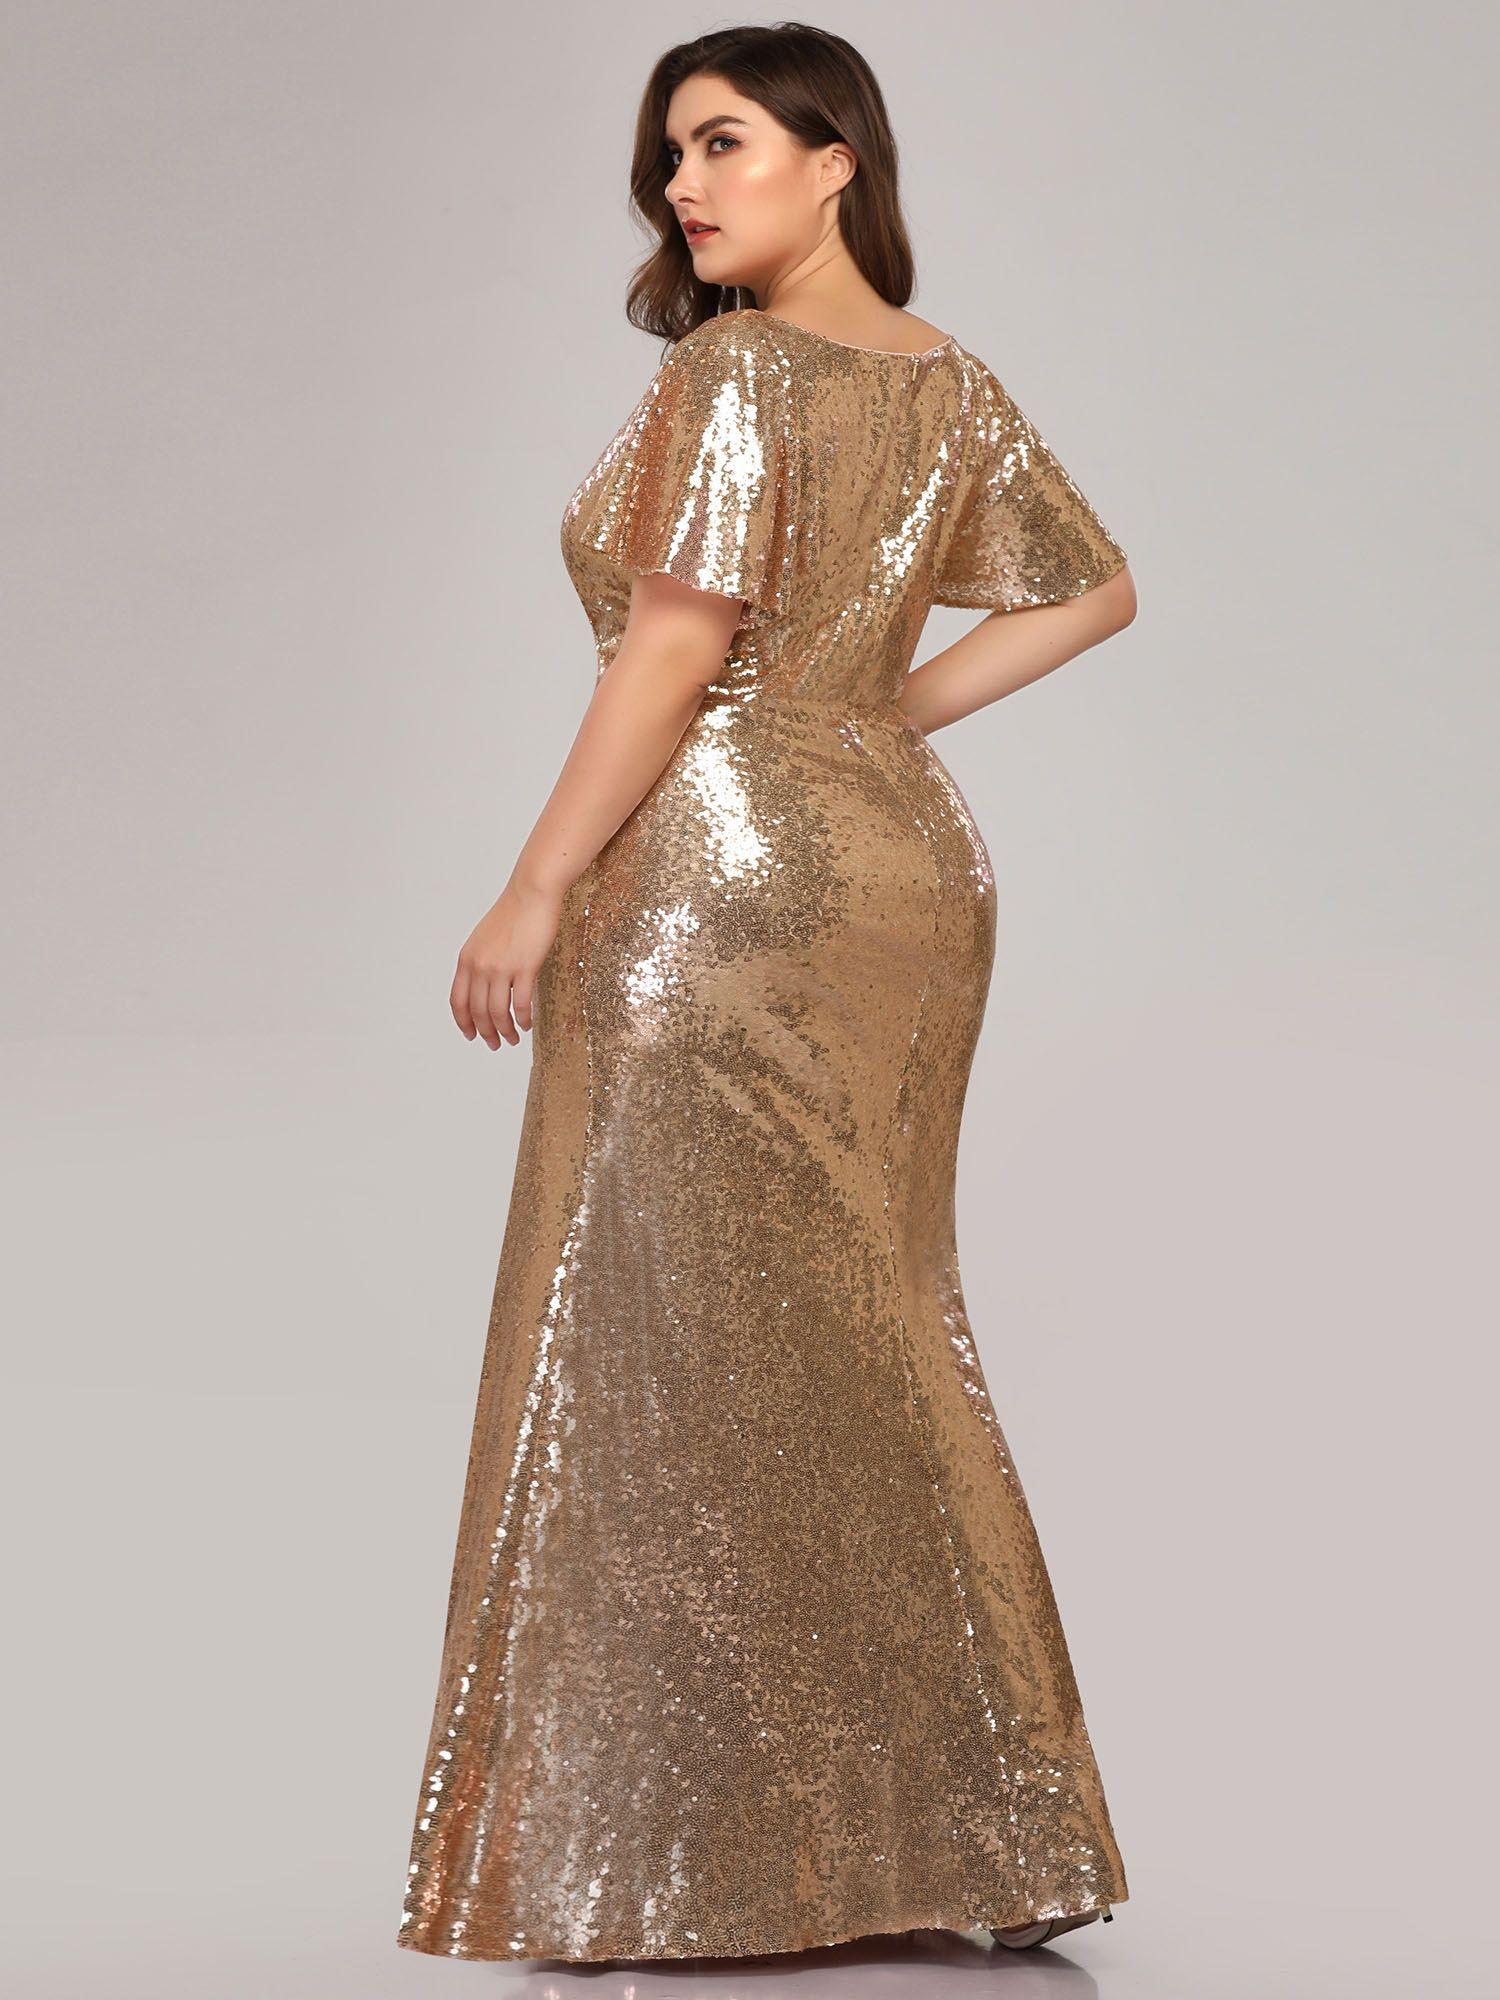 Ever Pretty Ever Pretty Womens Elegant V Neck Formal Evening Dresses For Women 07988 Gold Us16 Walmart Com Elegant Maxi Dress Sequin Formal Dress Plus Size Gowns Formal [ 2000 x 1500 Pixel ]